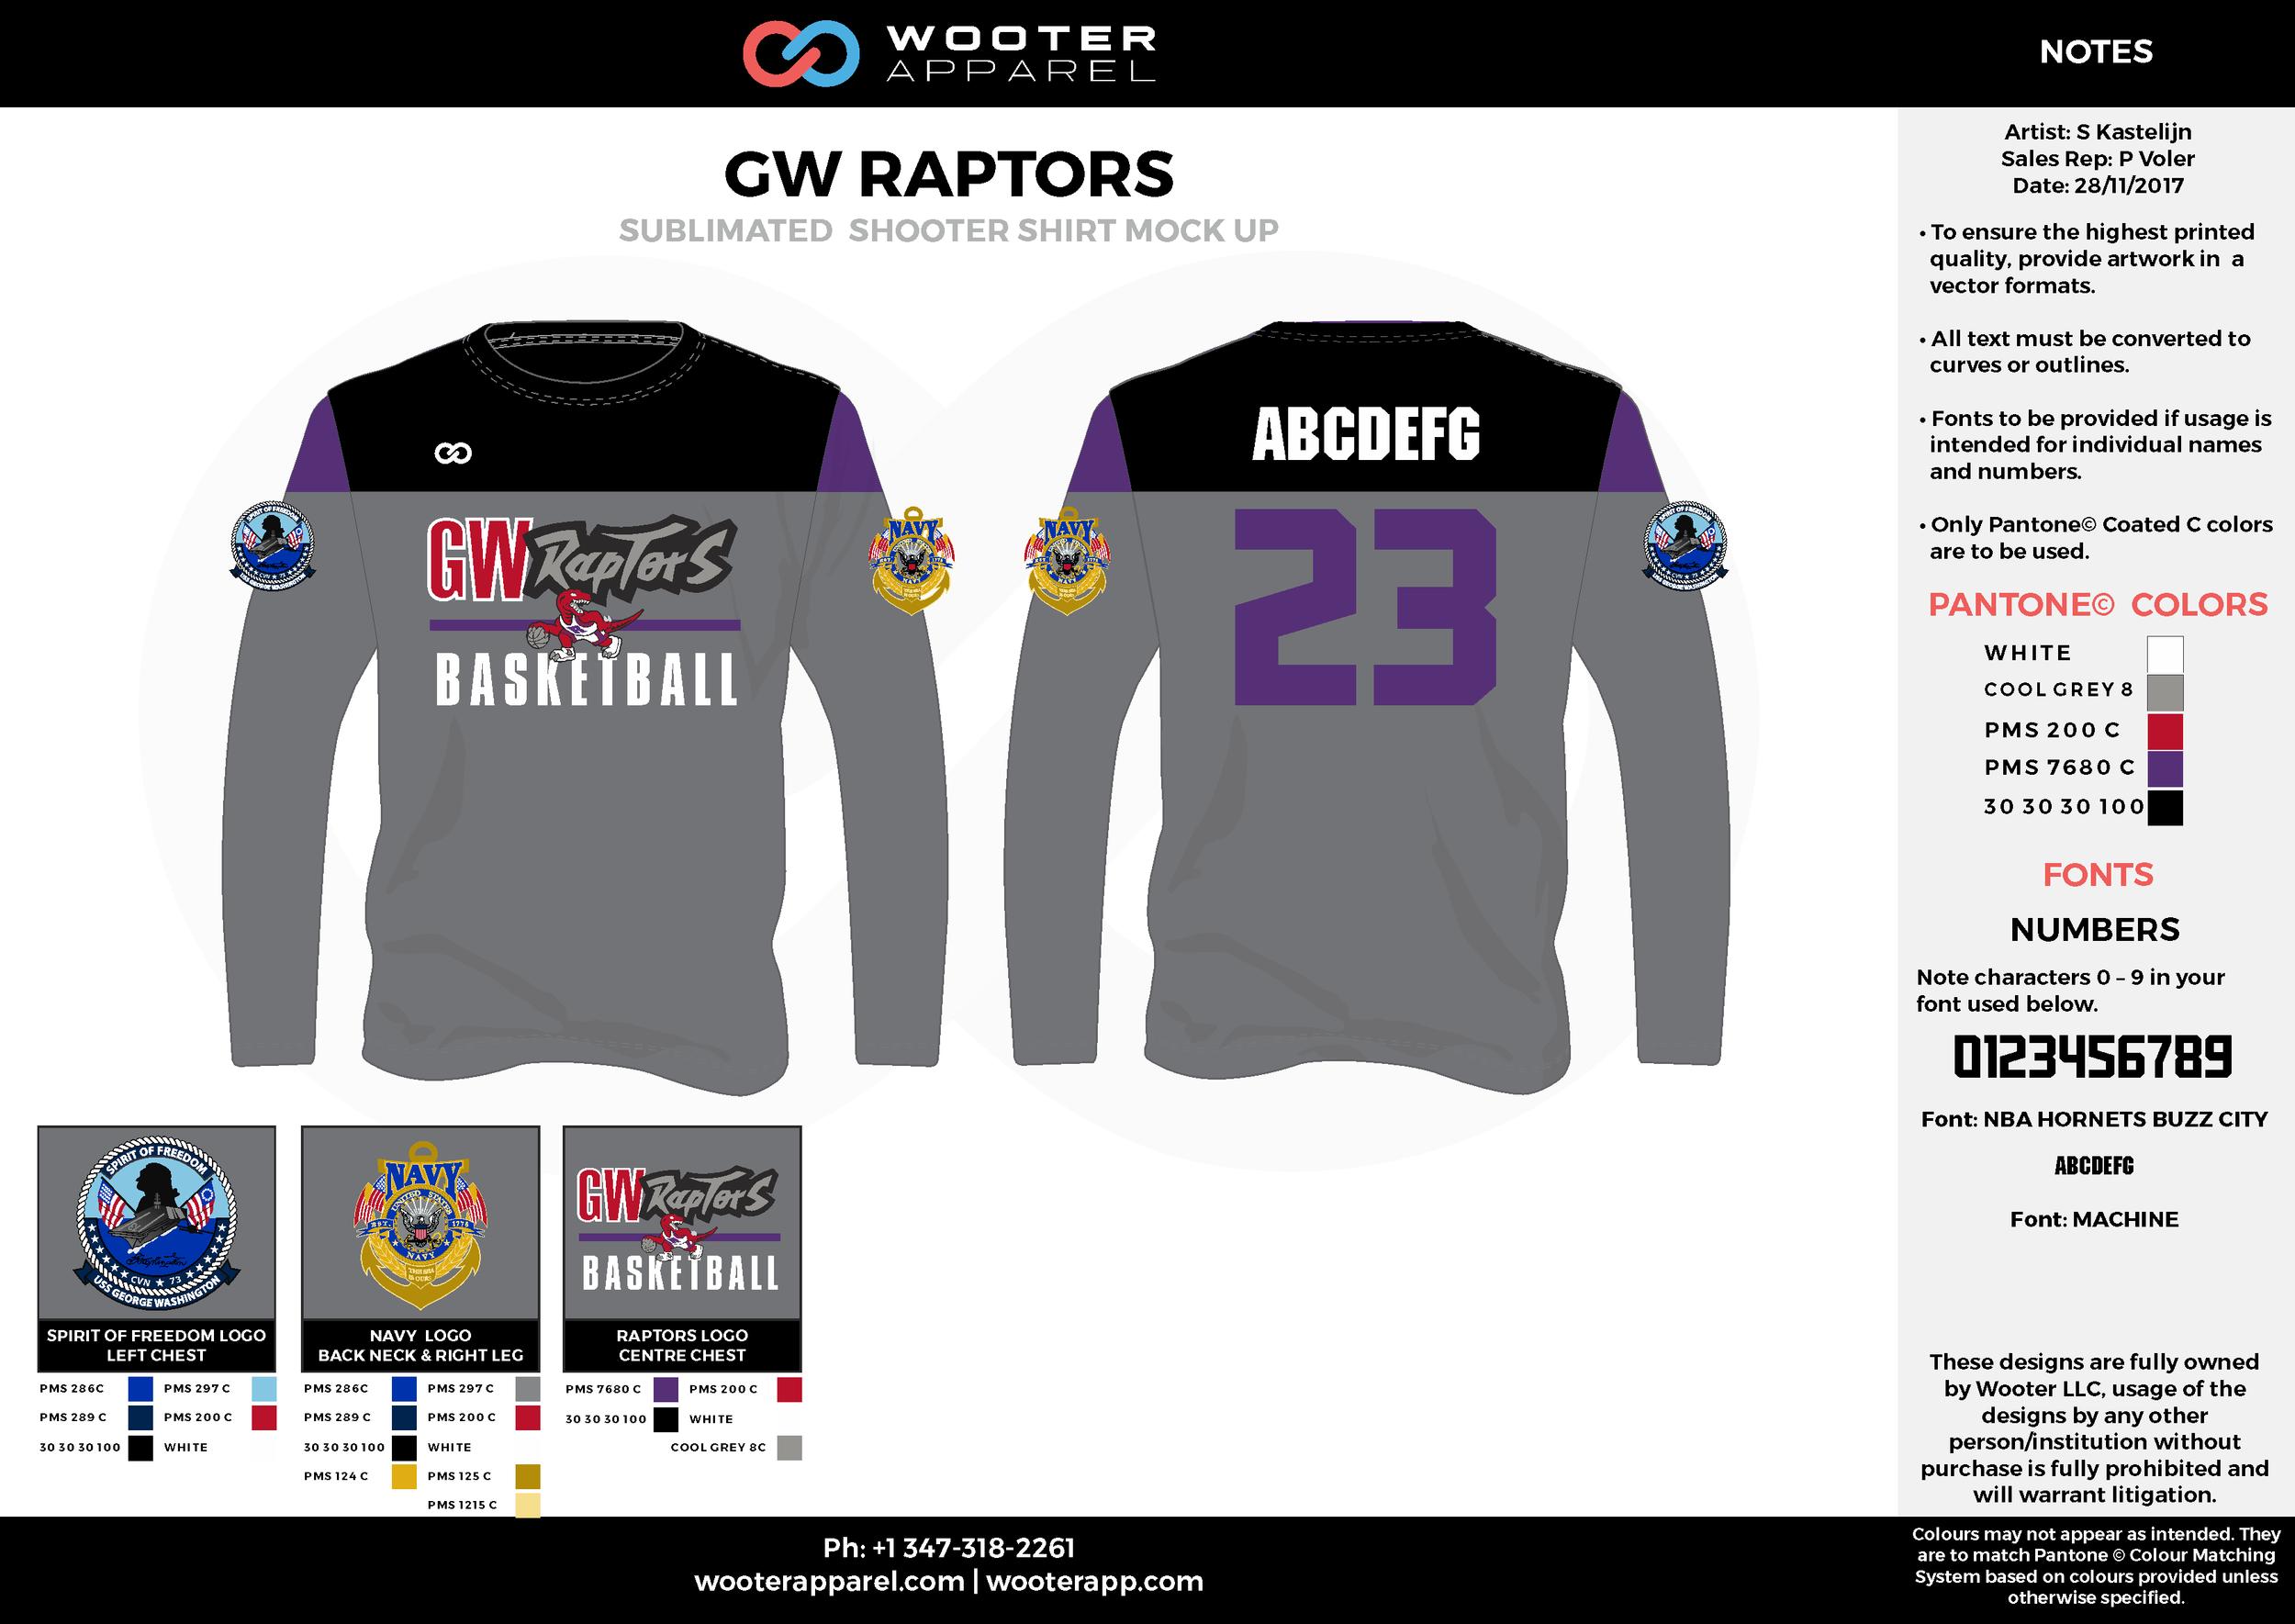 GW RAPTORS gray red purple black Basketball Long Sleeve Shooting Shirt